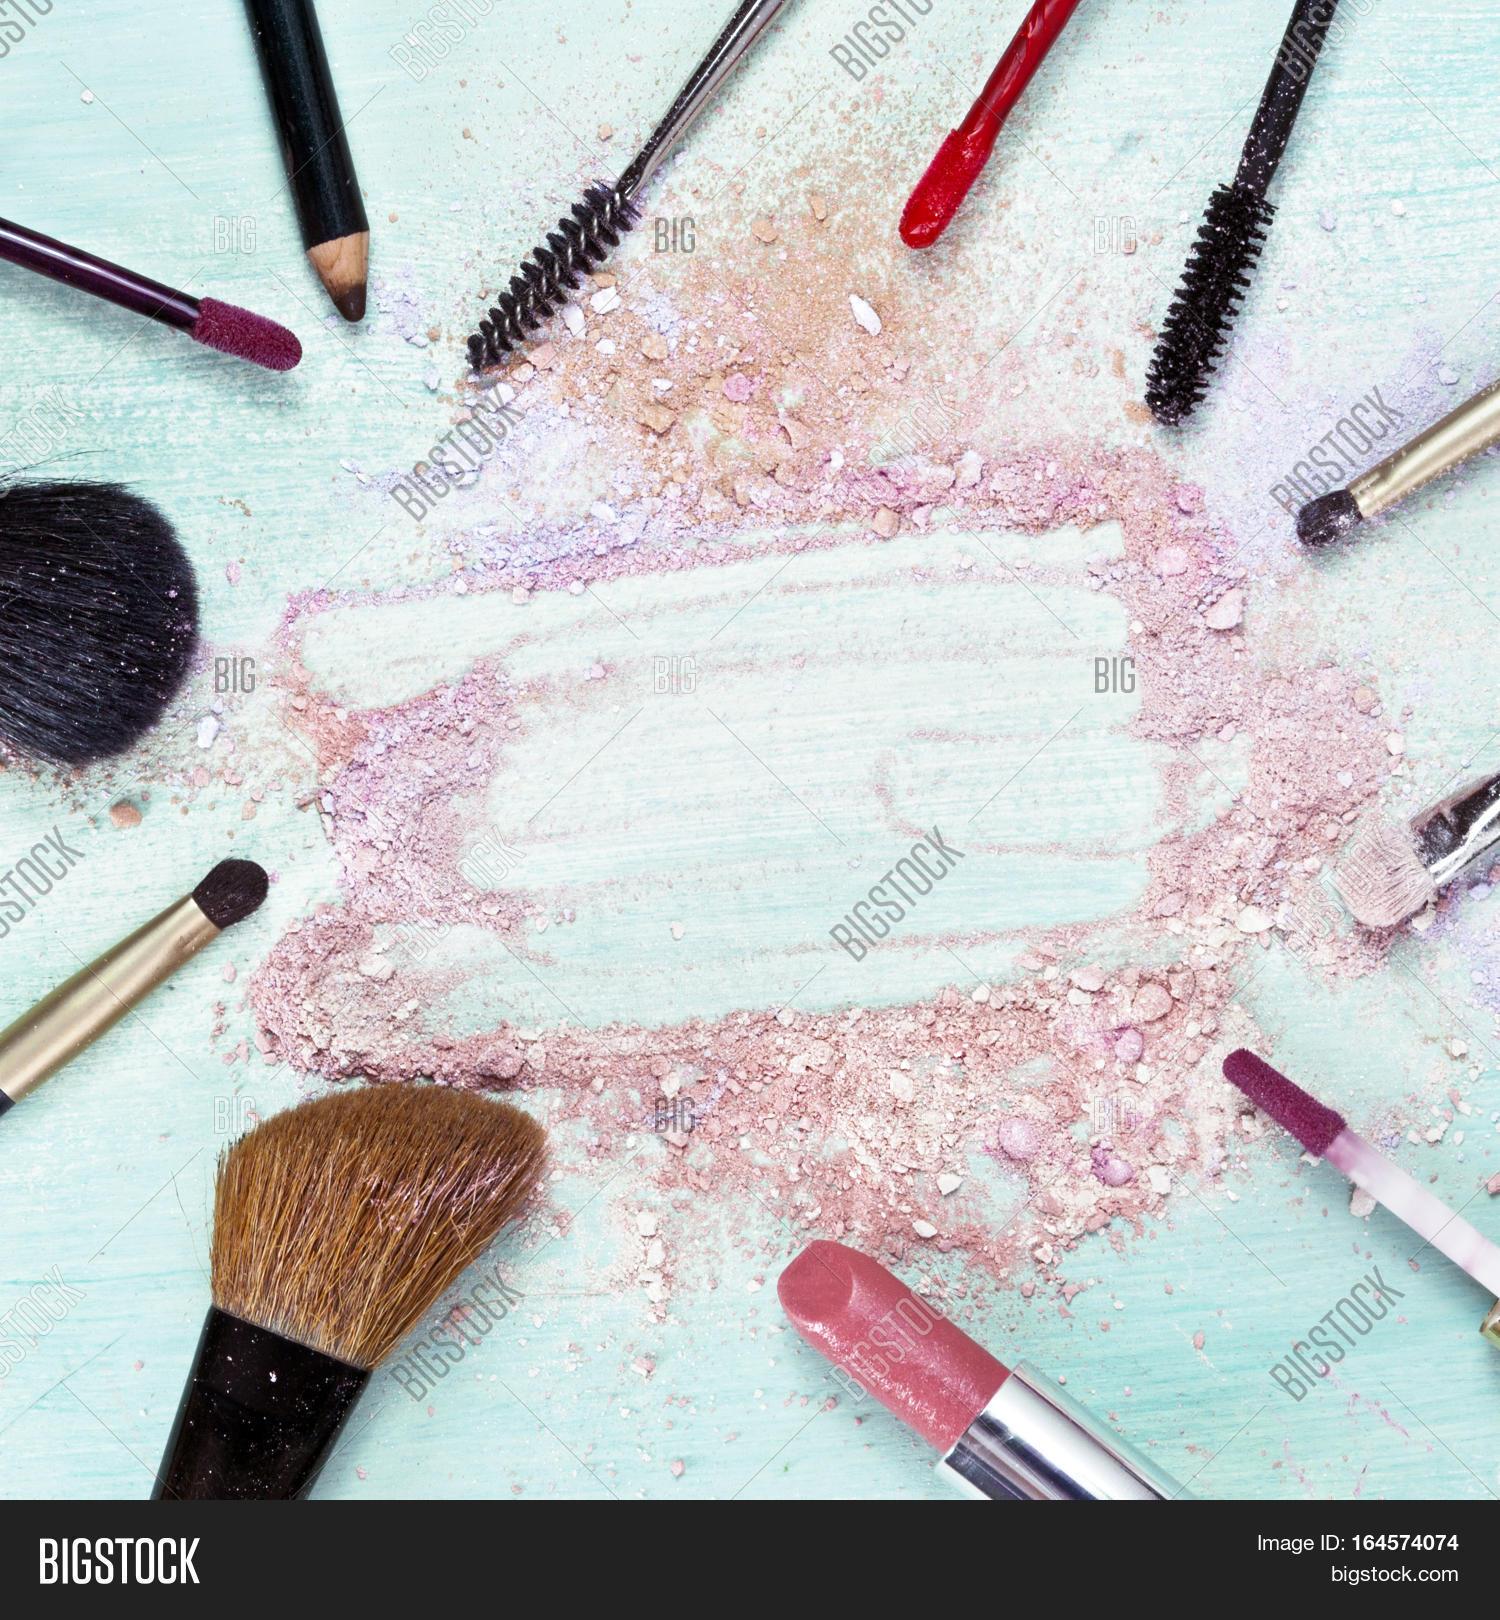 Makeup Brushes Image & Photo (Free Trial)   Bigstock